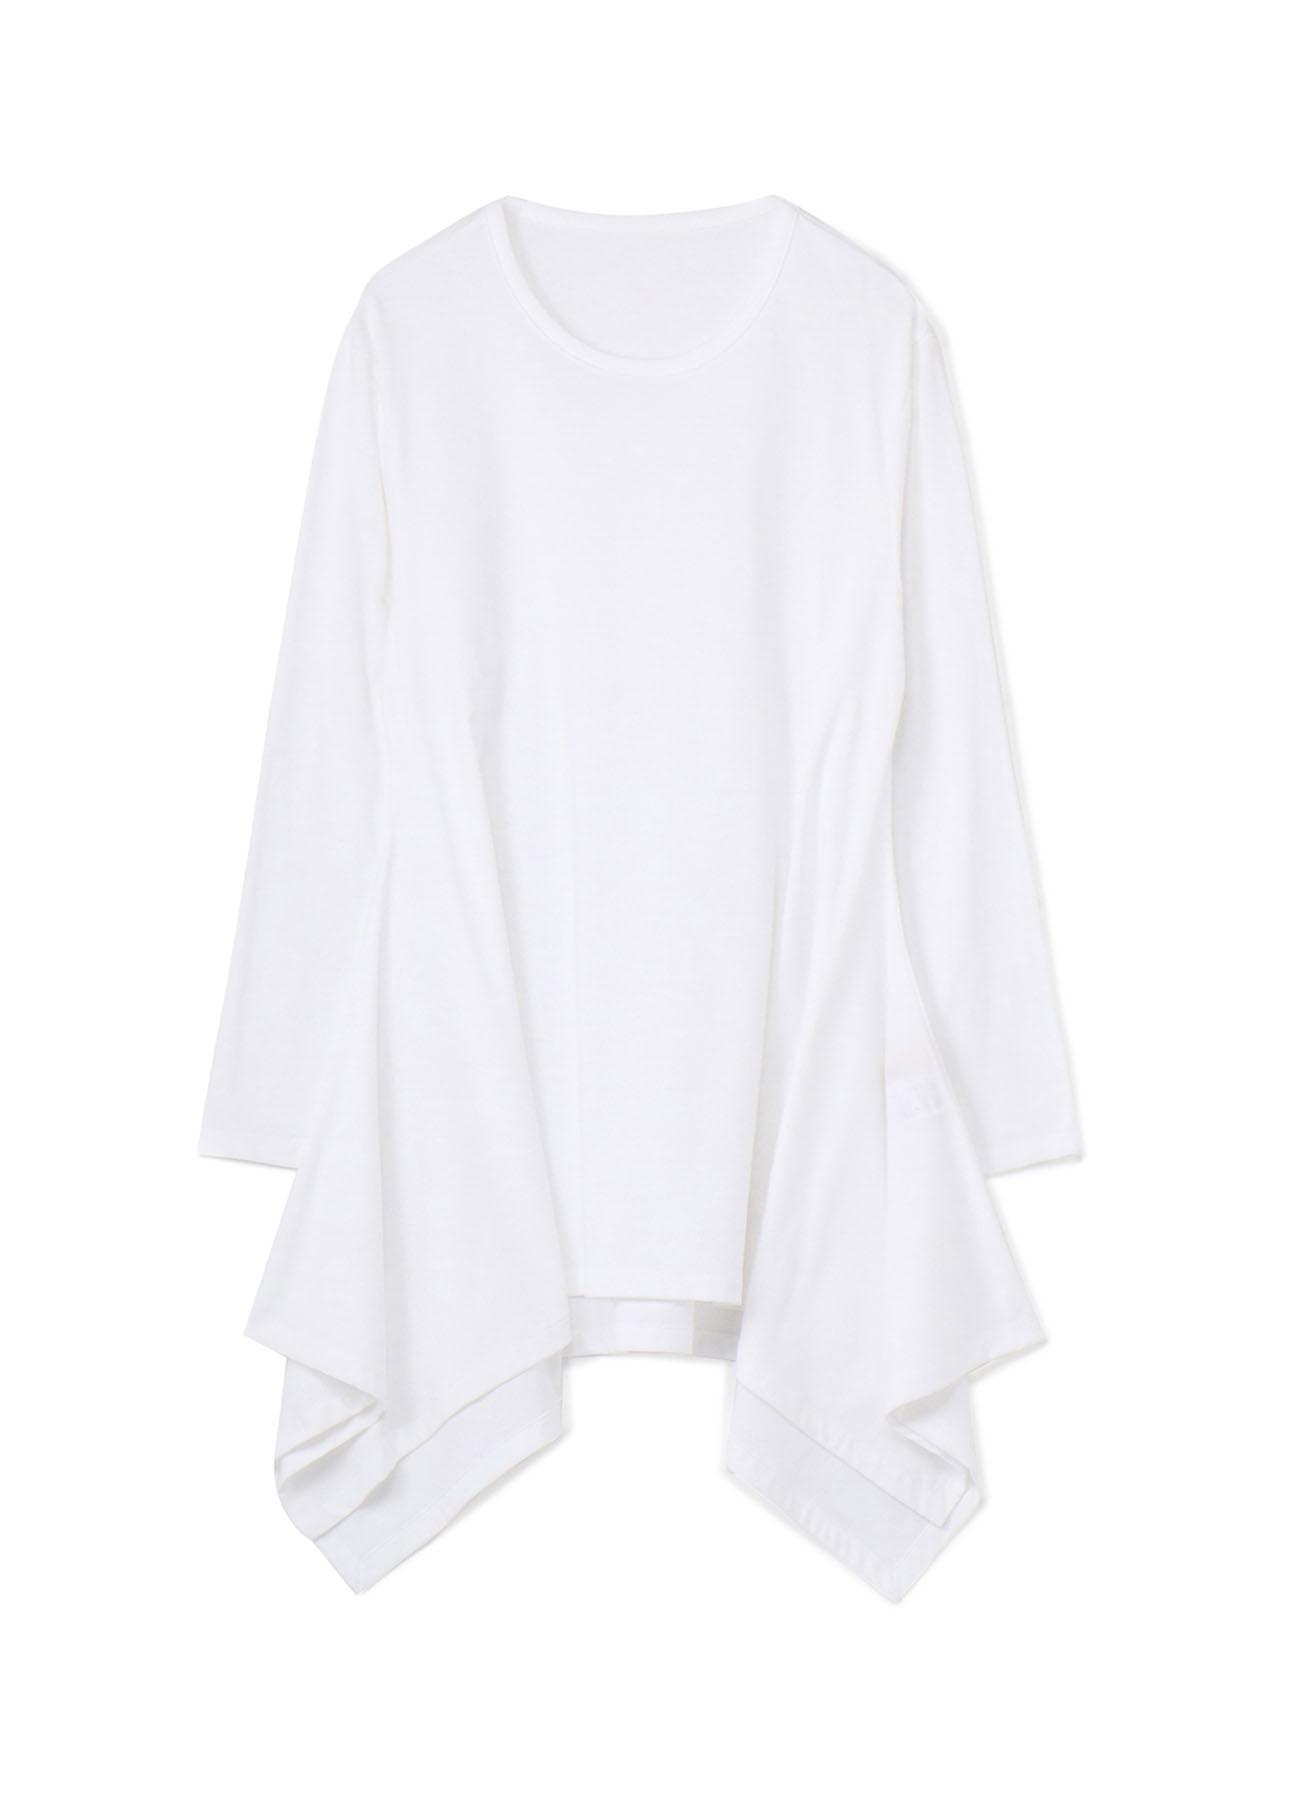 30/Cotton Jersey U-neck Drape Long Sleeves Cut Sew